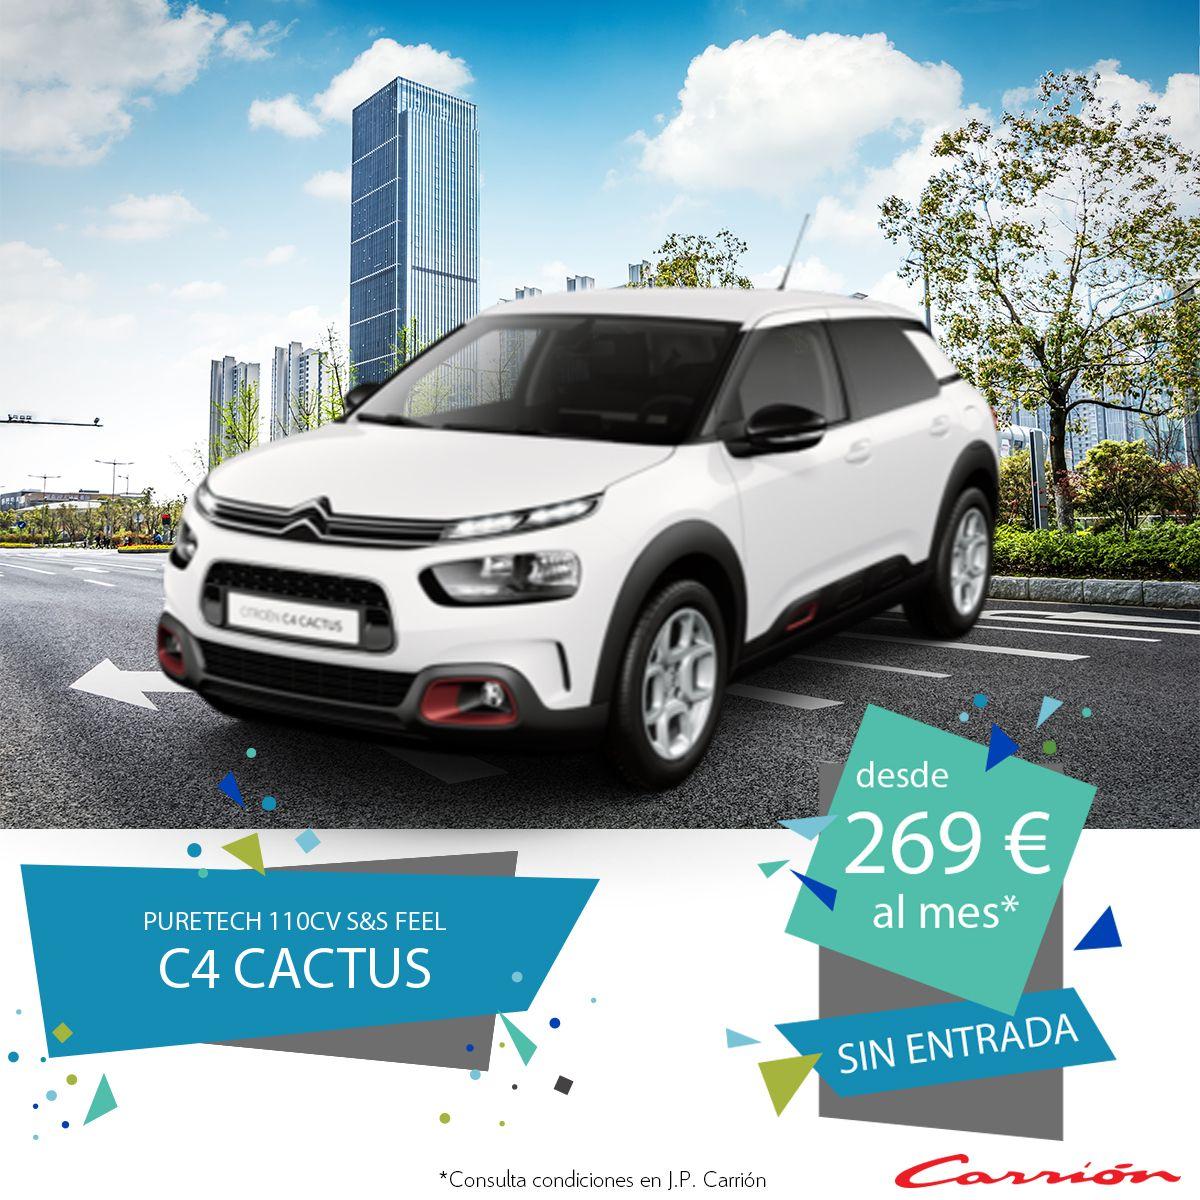 C4 Cactus PureTech 110CV S&S Feel desde 269 €/mes* ¡Sin entrada!